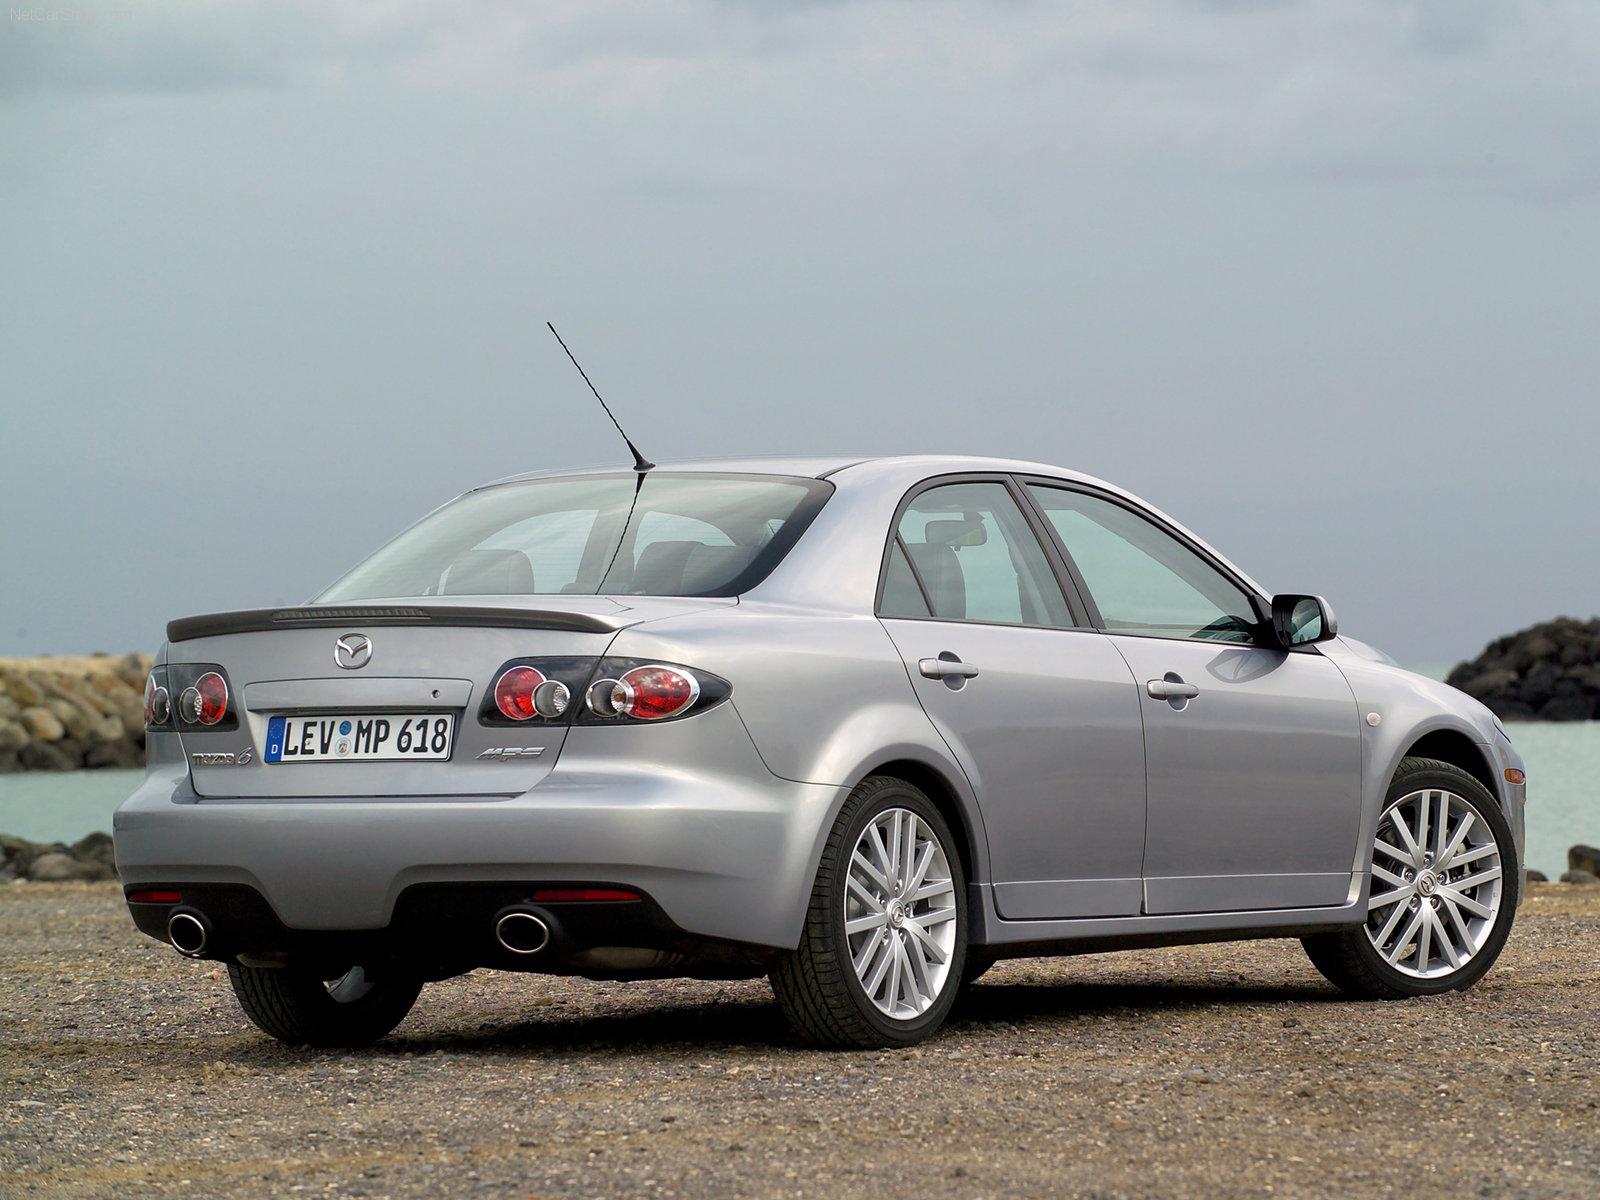 http://www.carsbase.com/photo/Mazda-6_MPS_mp34_pic_33061.jpg